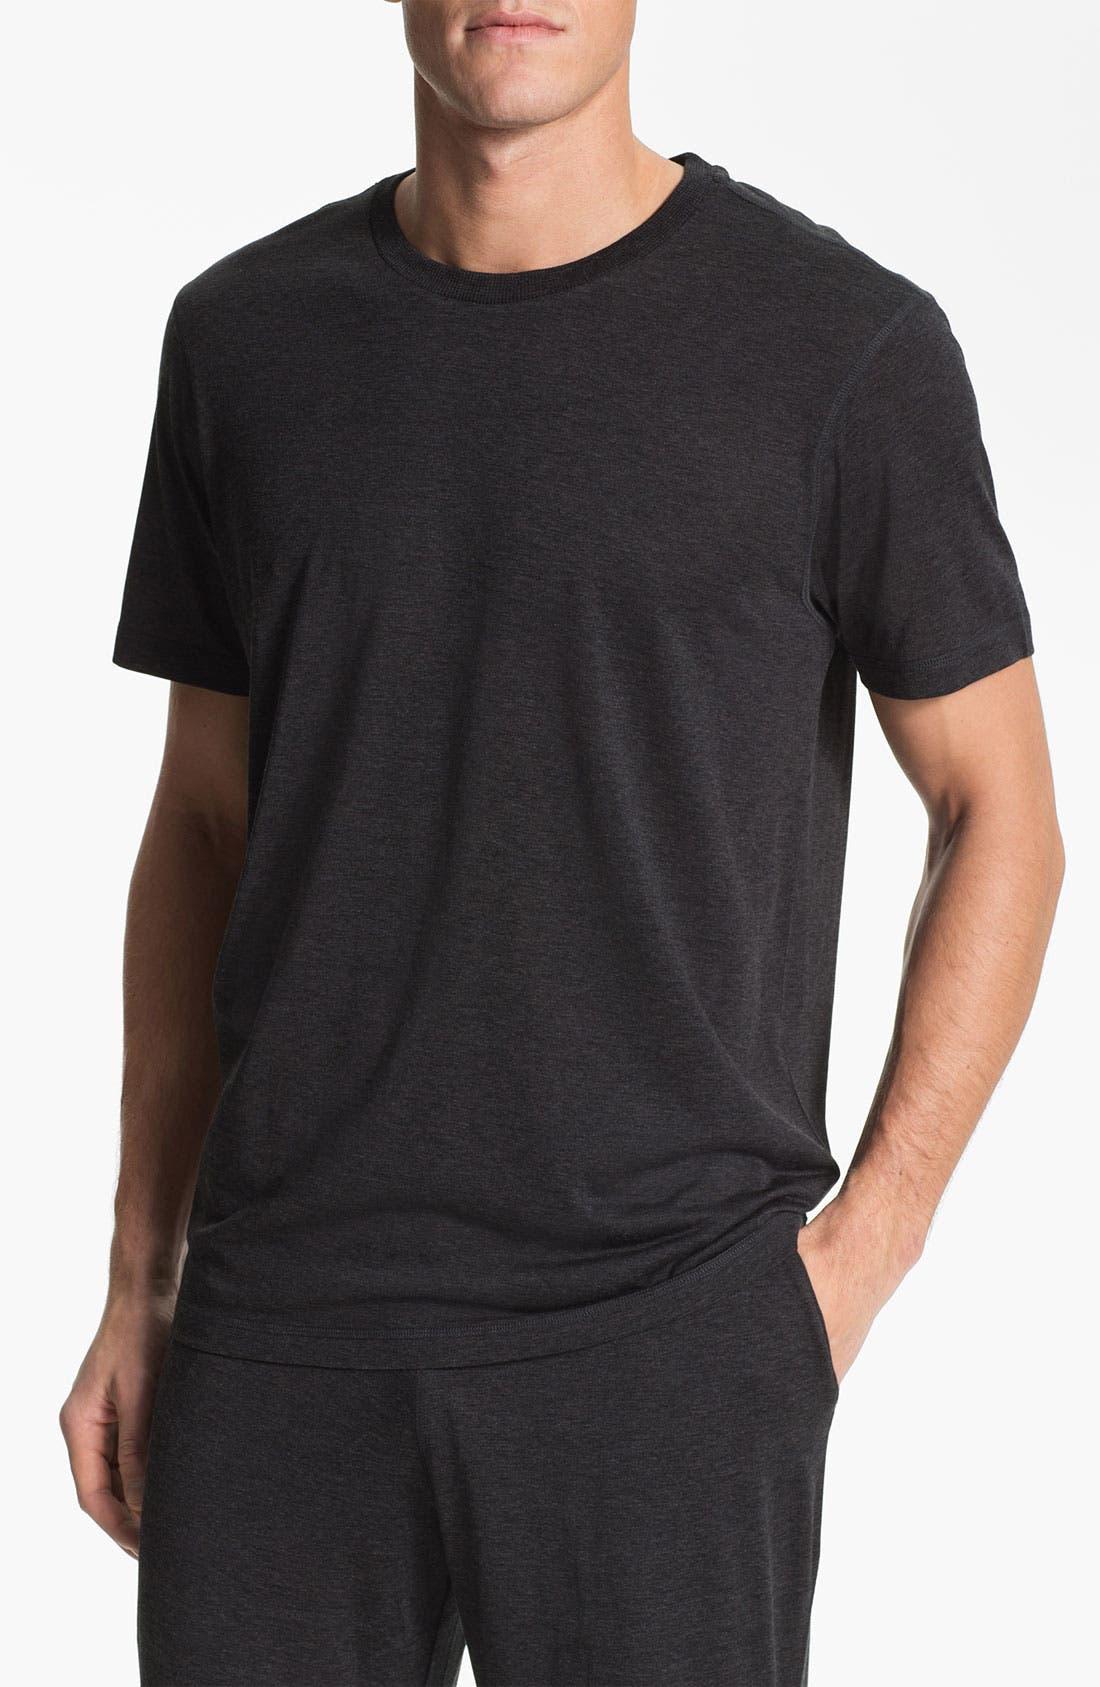 Main Image - Daniel Buchler Silk & Cotton T-Shirt